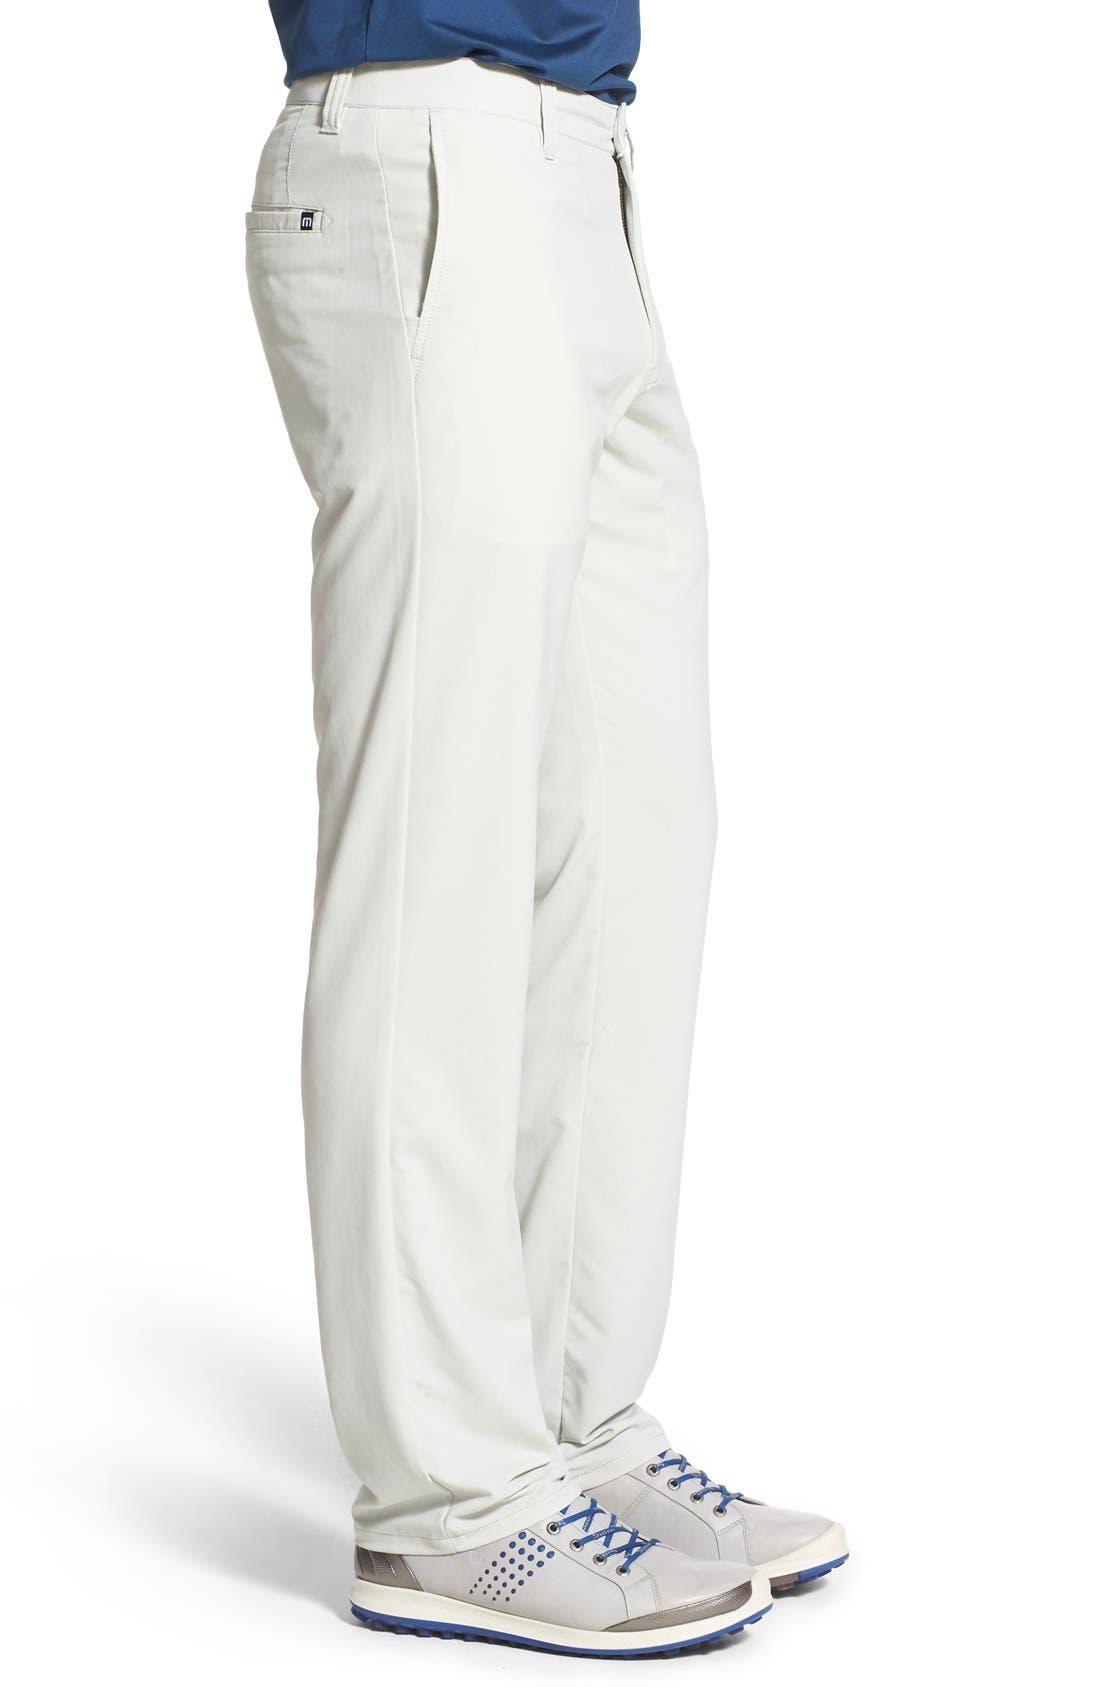 'Hough' Trim Fit Golf Pants,                             Alternate thumbnail 3, color,                             Dawn Blue/ Grey